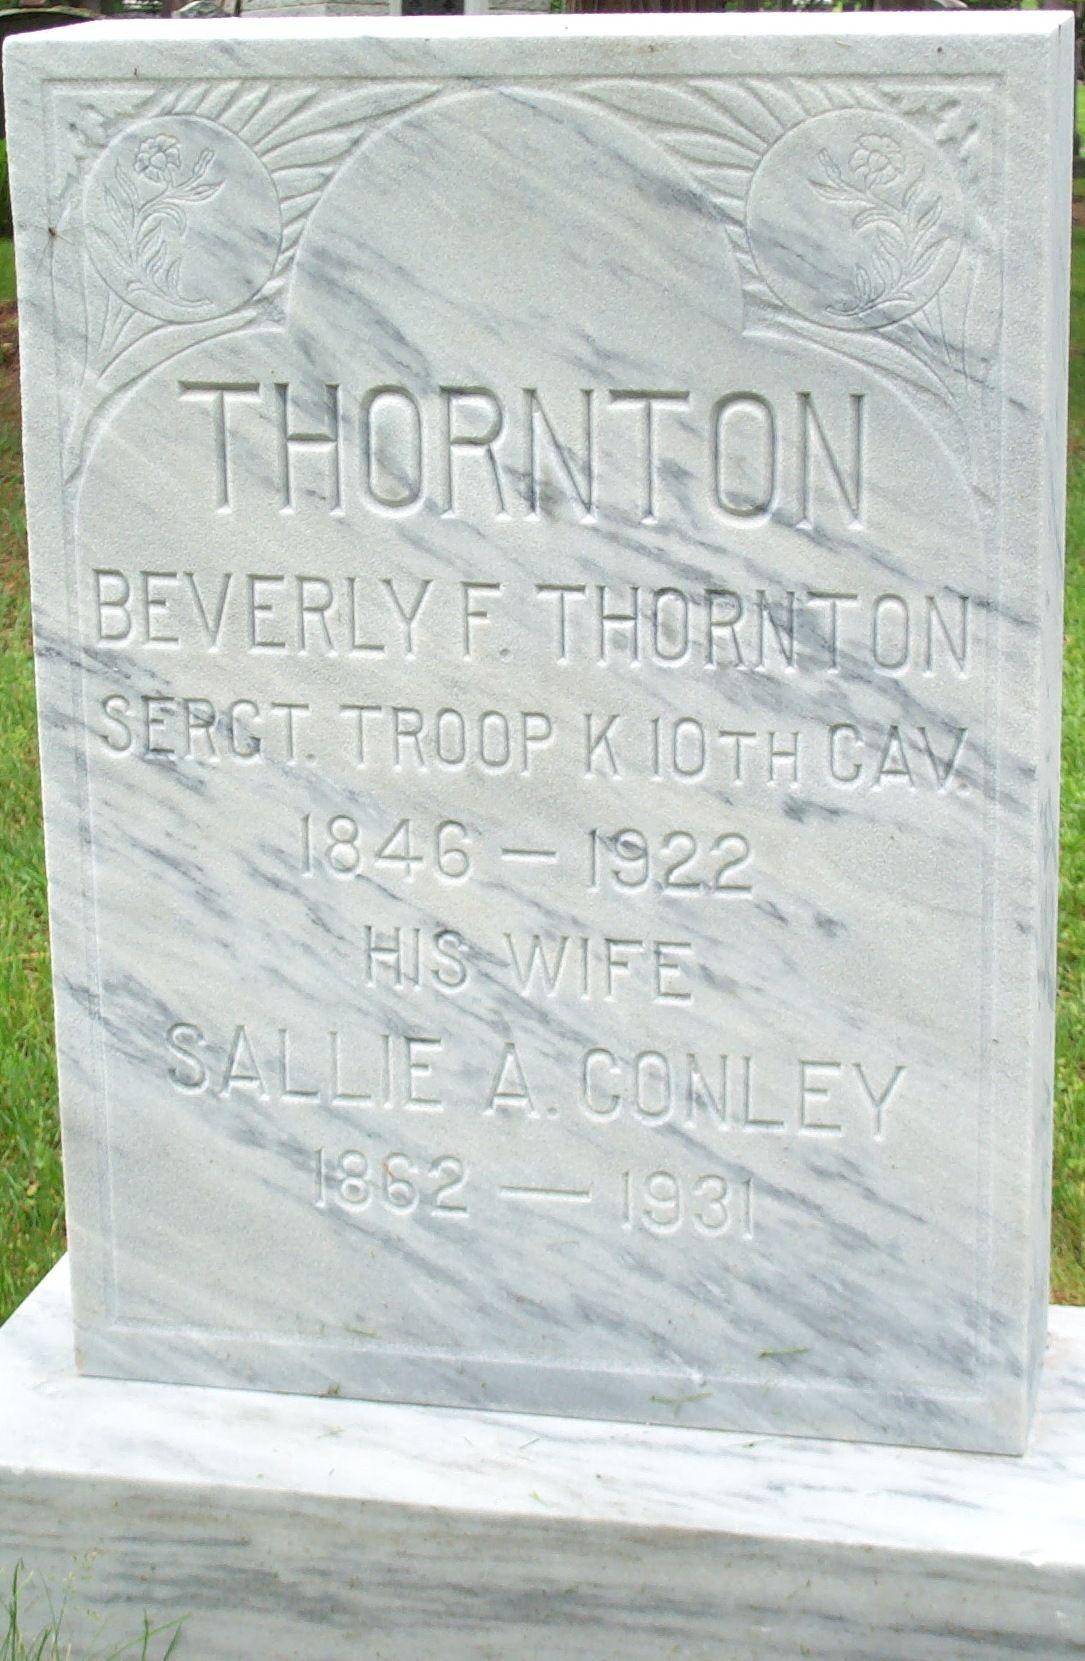 Tombstone for Beverly Thornton and Sallie Ann Conley Thornton in Burlington, Vermont.